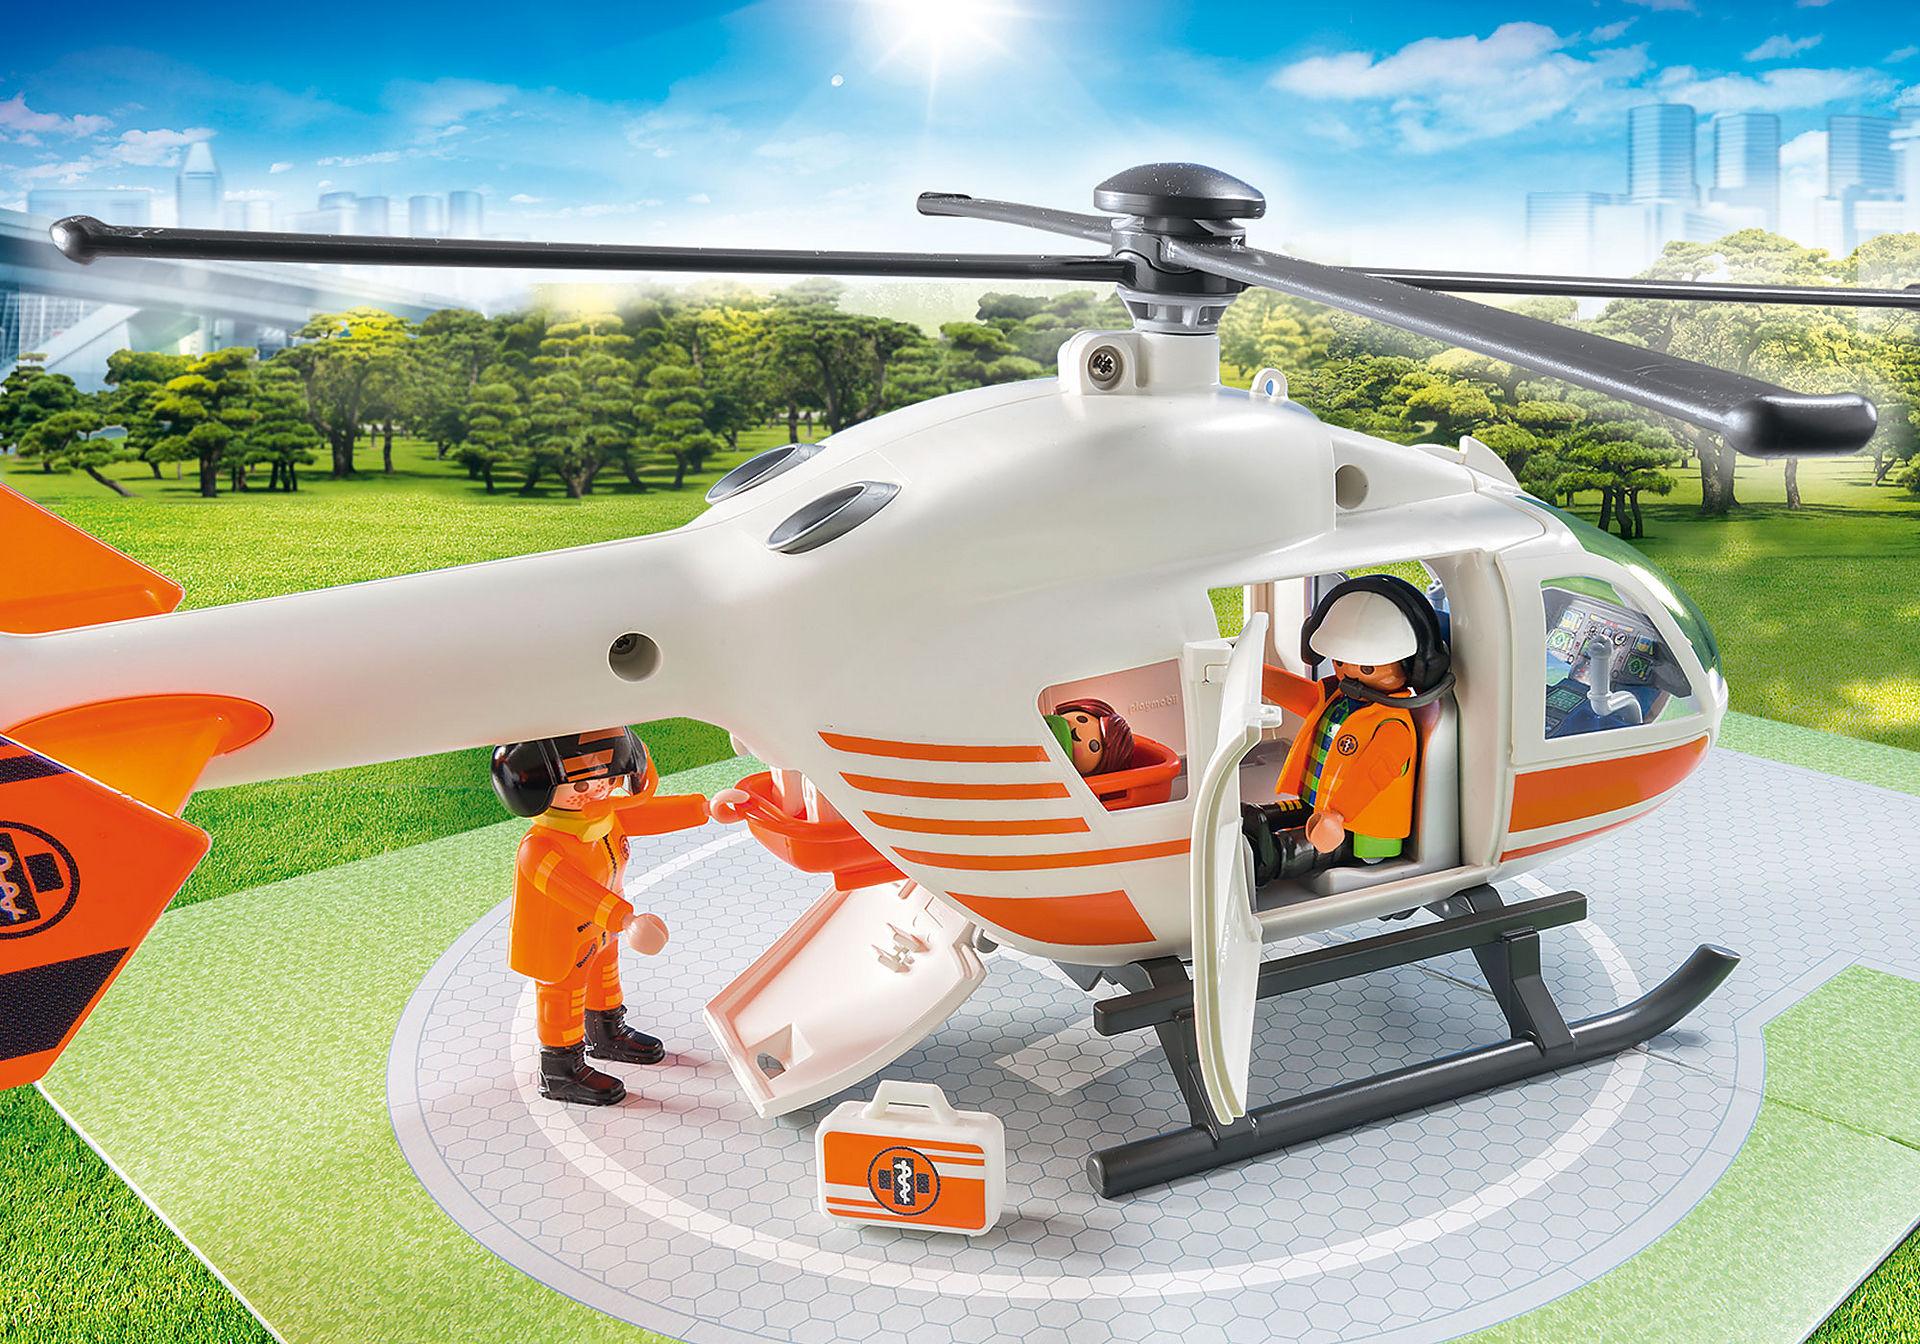 http://media.playmobil.com/i/playmobil/70048_product_extra2/Räddningshelikopter